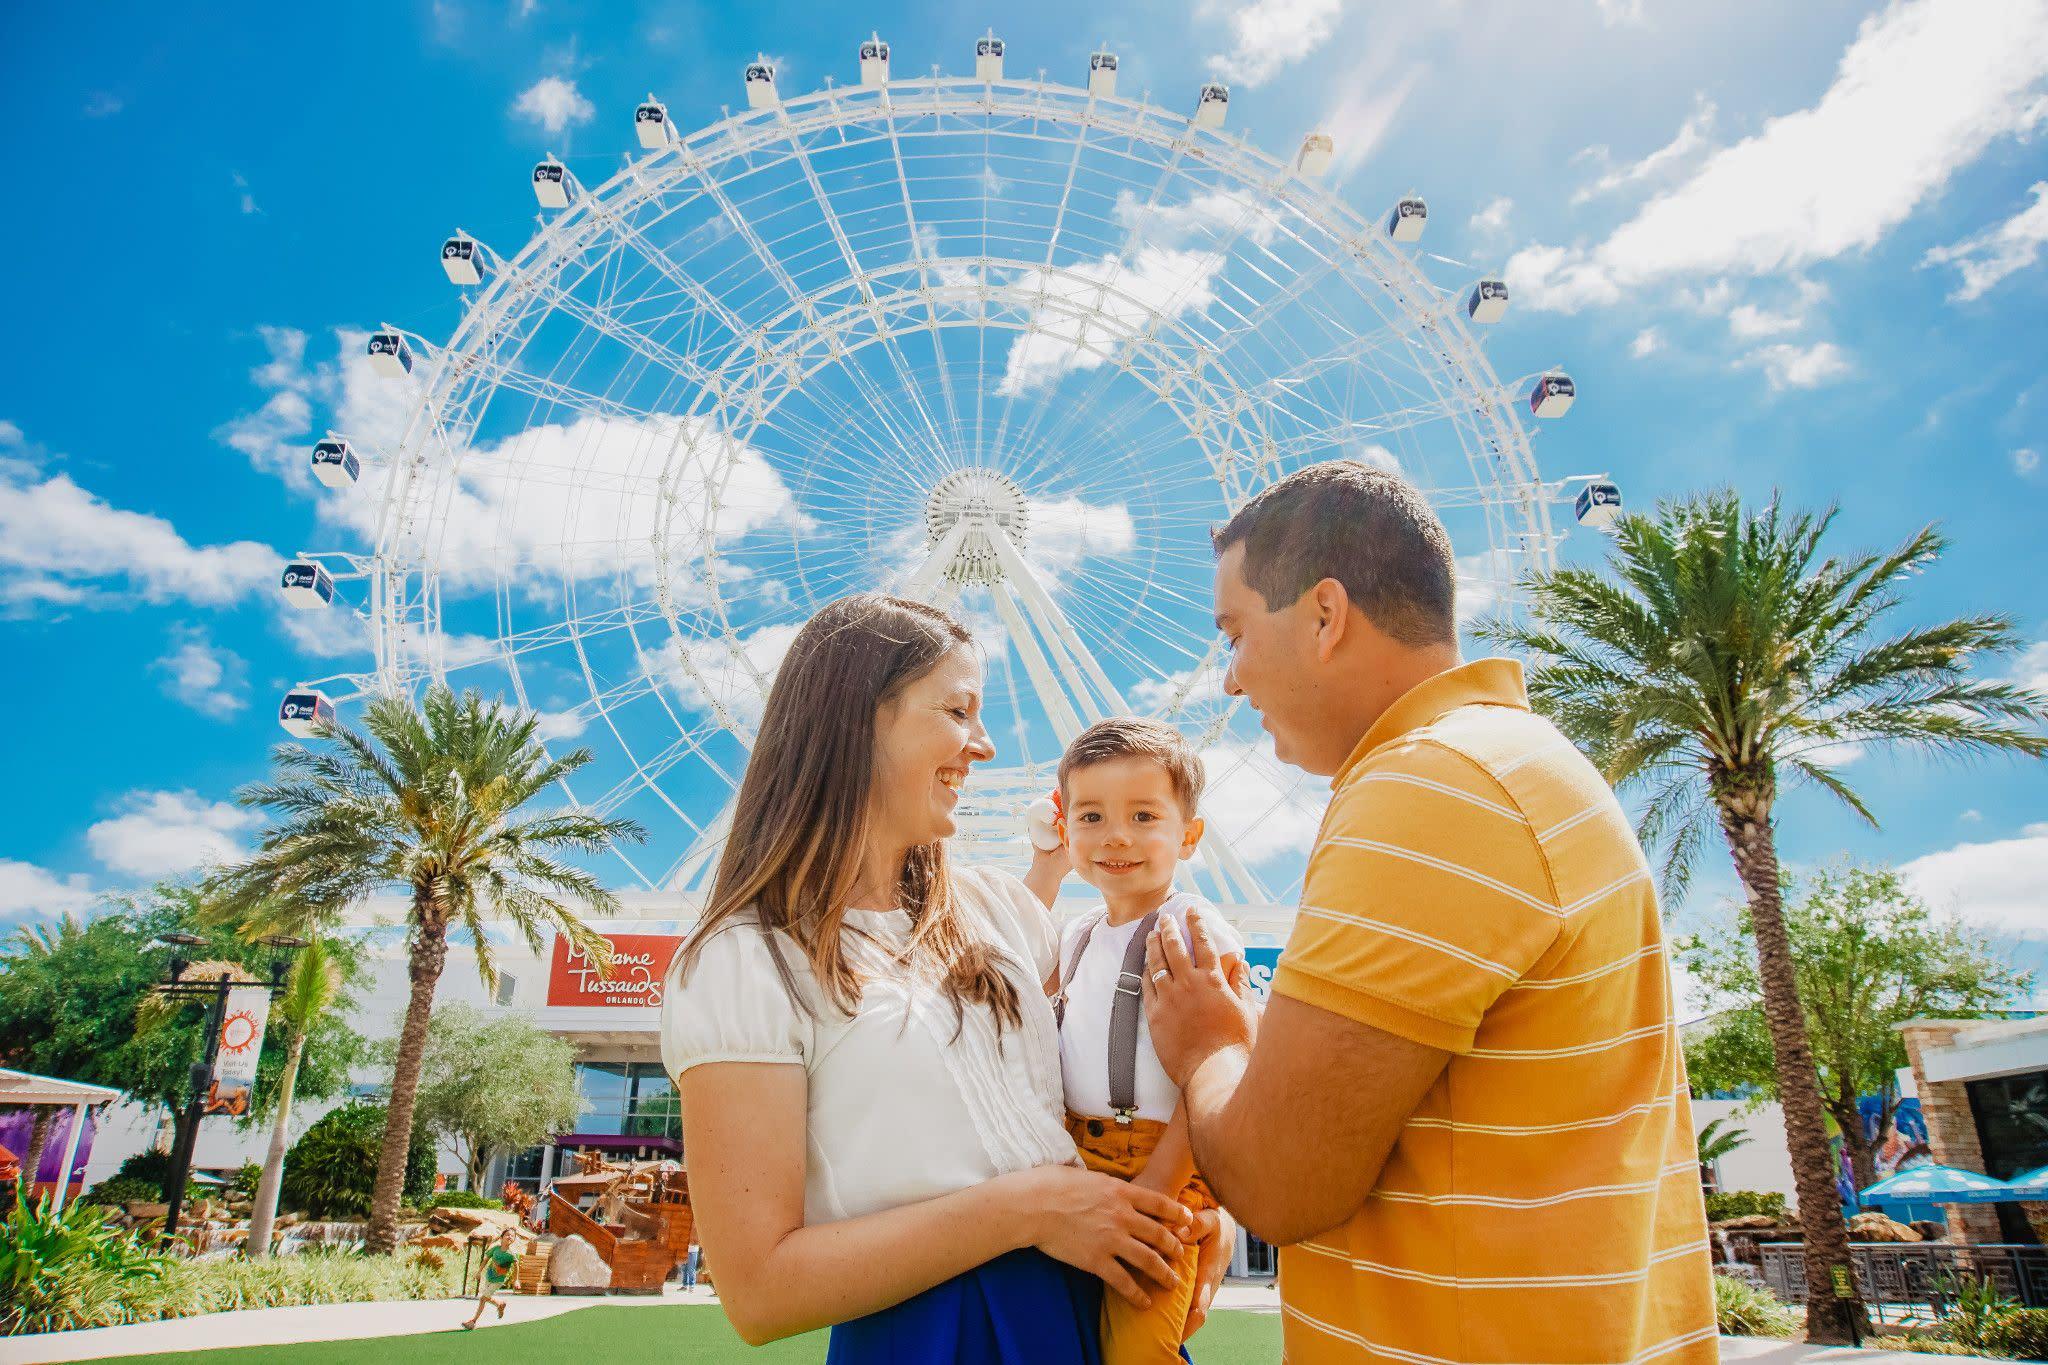 The Wheel at ICON Park in Orlando